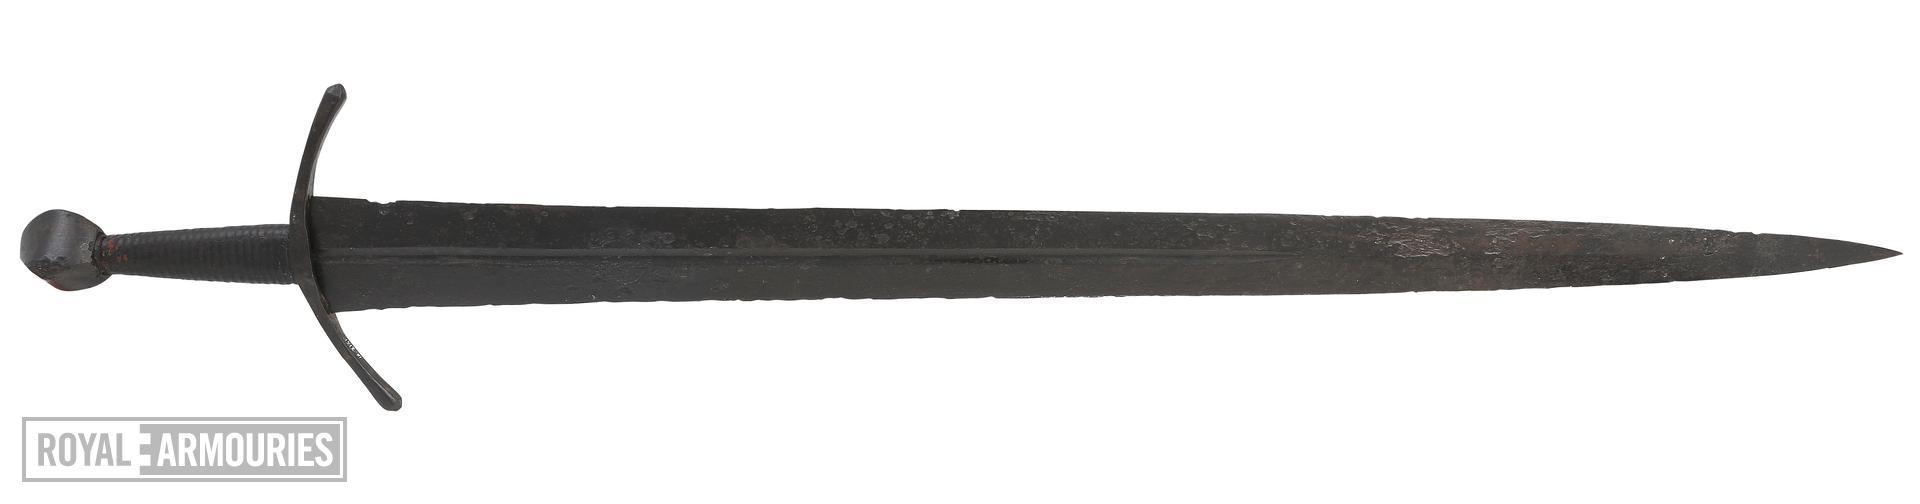 Sword. Oakeshott type XIV. IX.2141